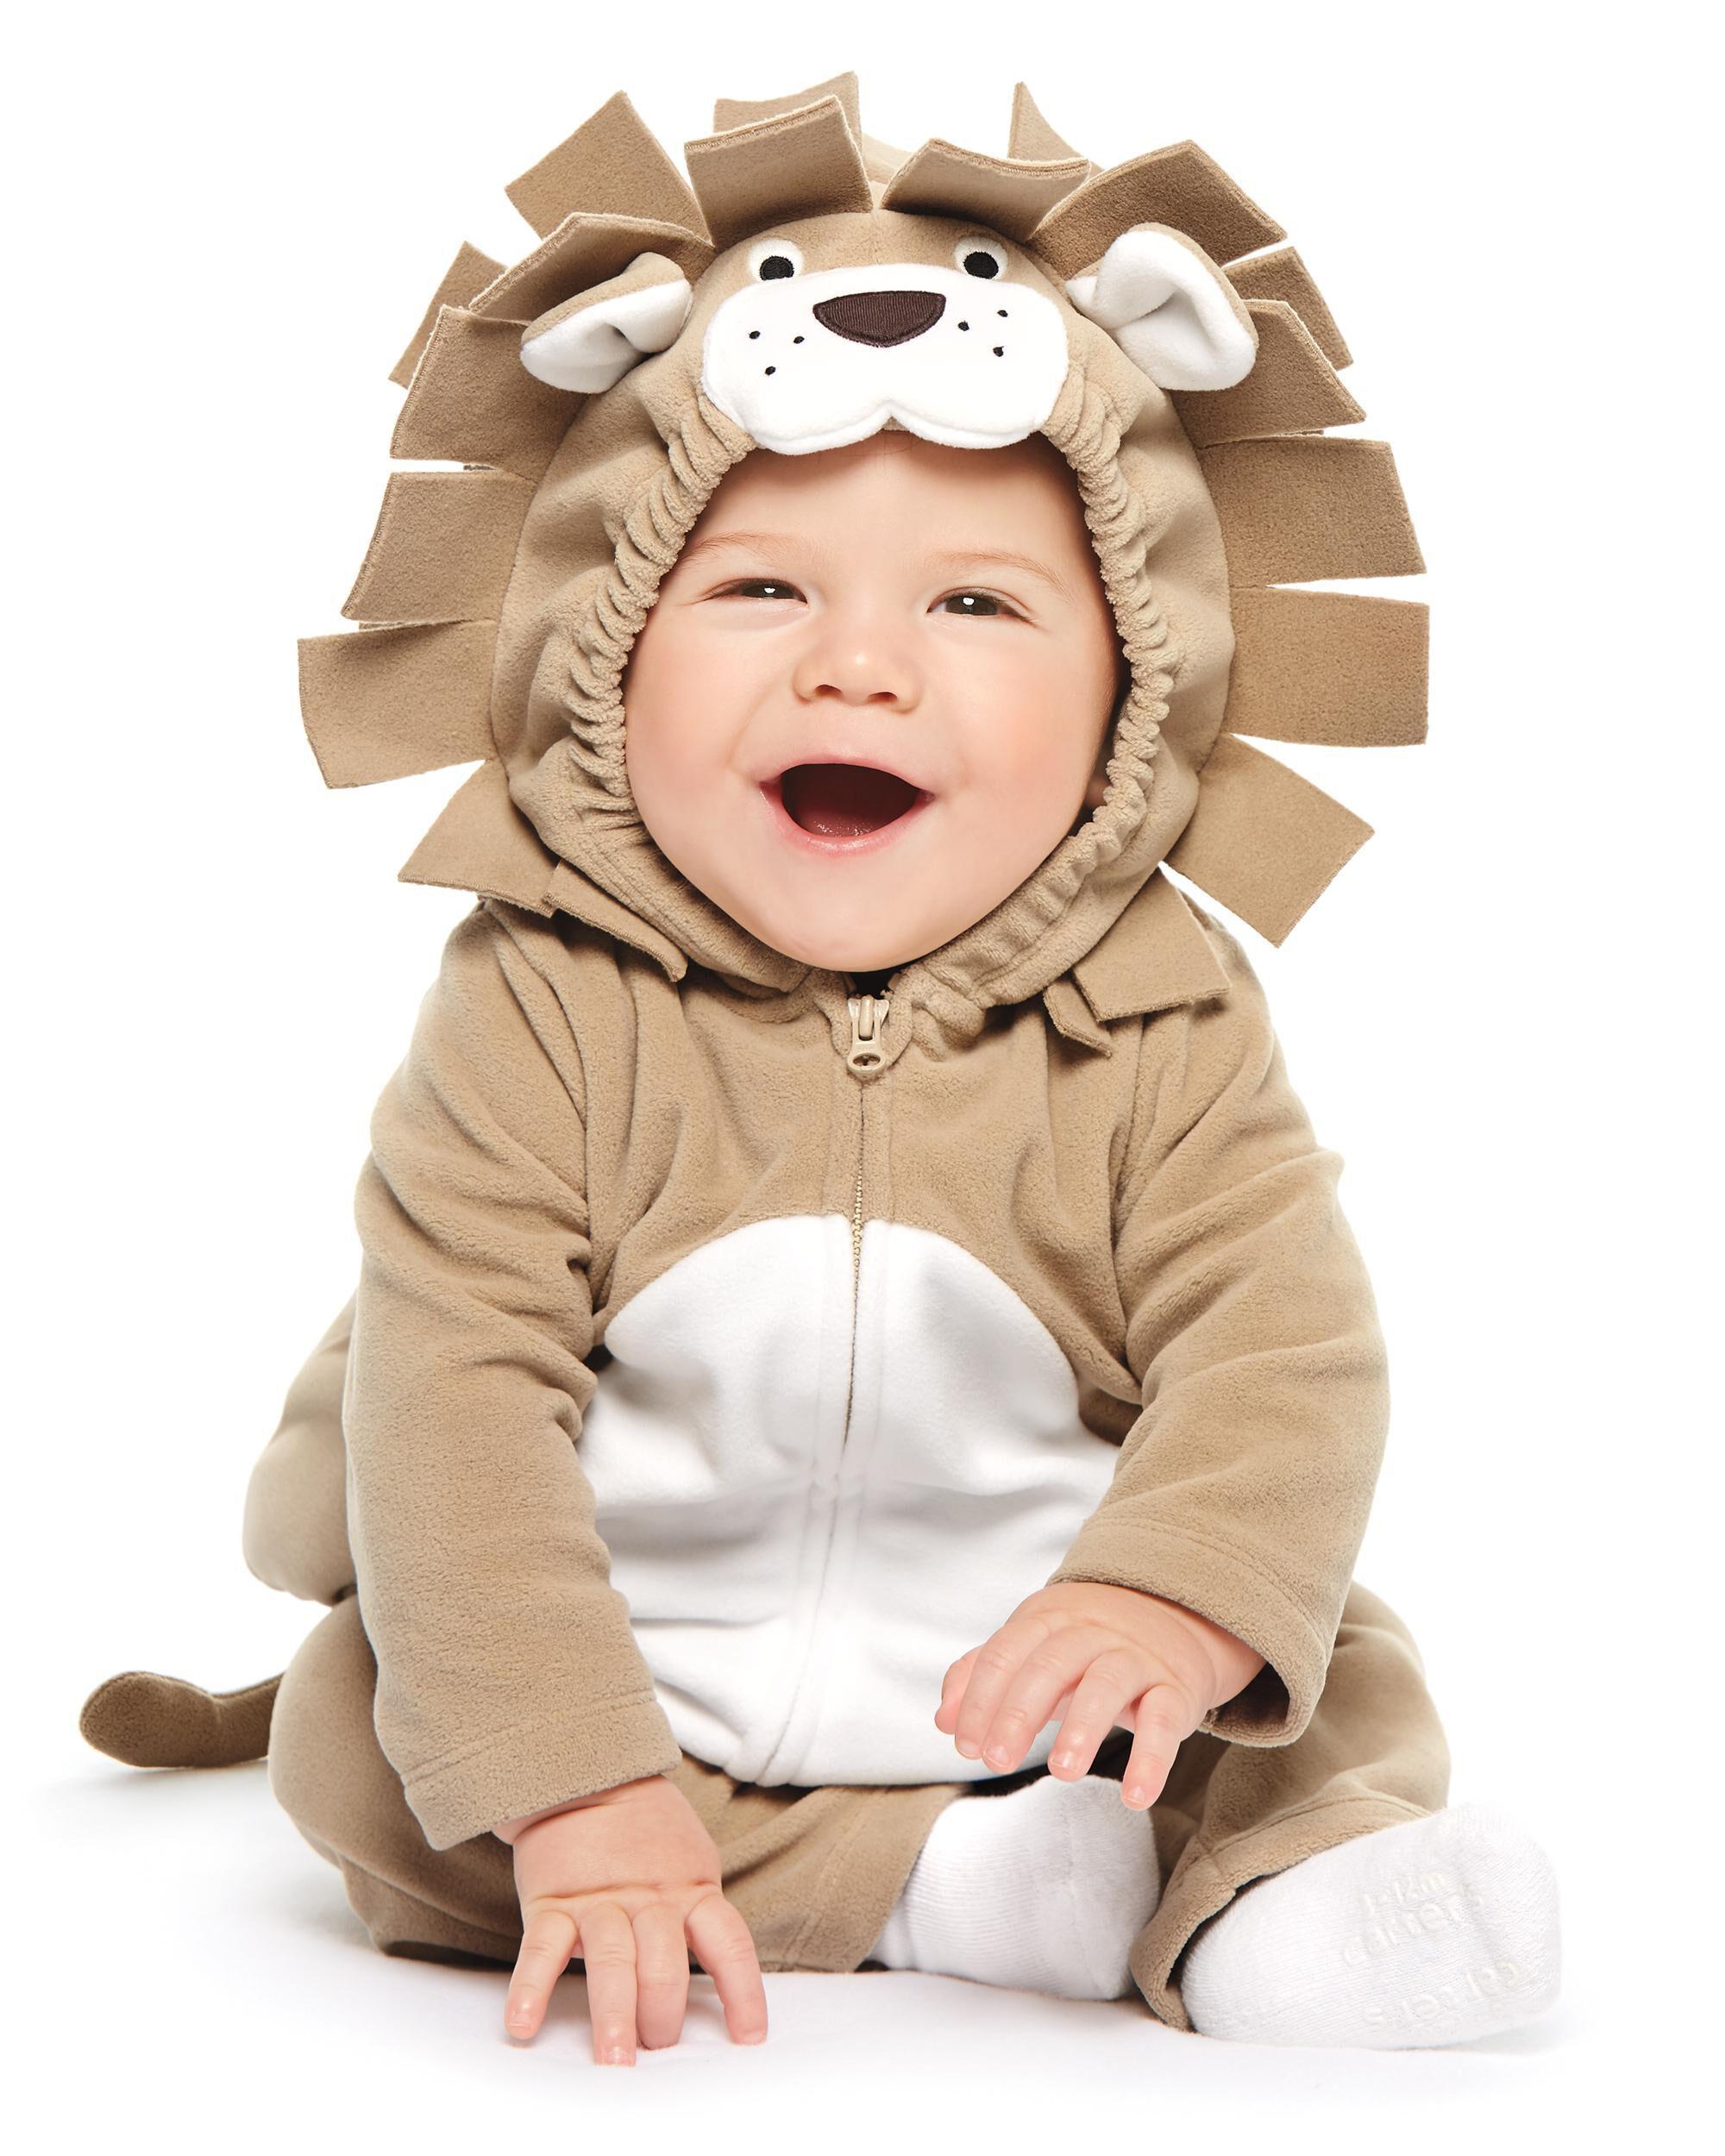 Little Lion Halloween Costume  sc 1 st  Skip Hop & Rewarding Moments | Carteru0027s